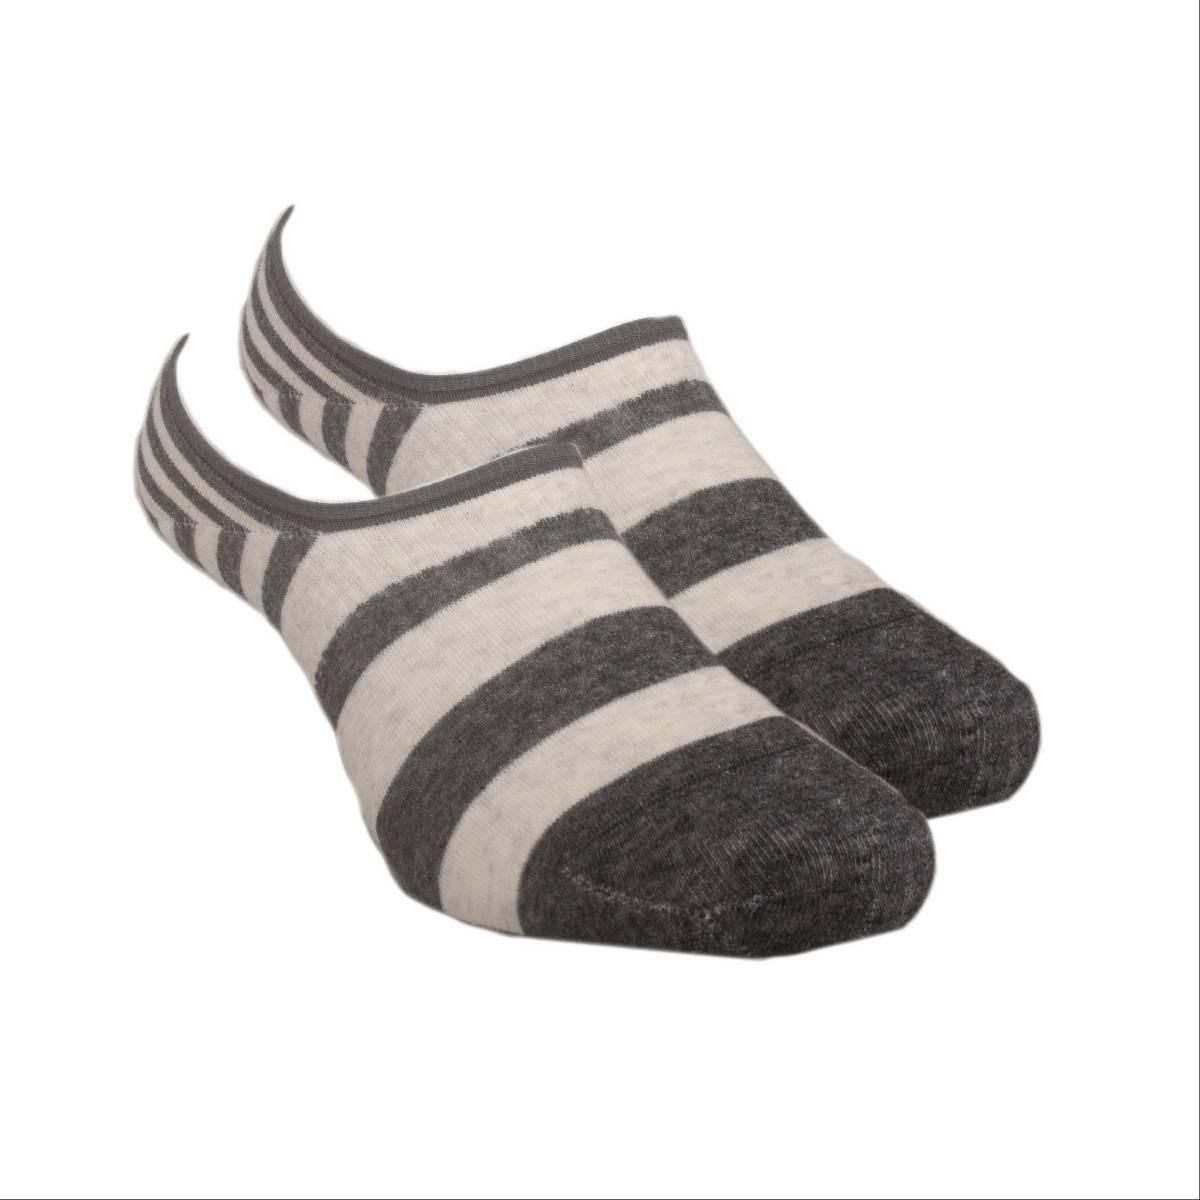 Kaos Kaki / Edgard Gray Socks